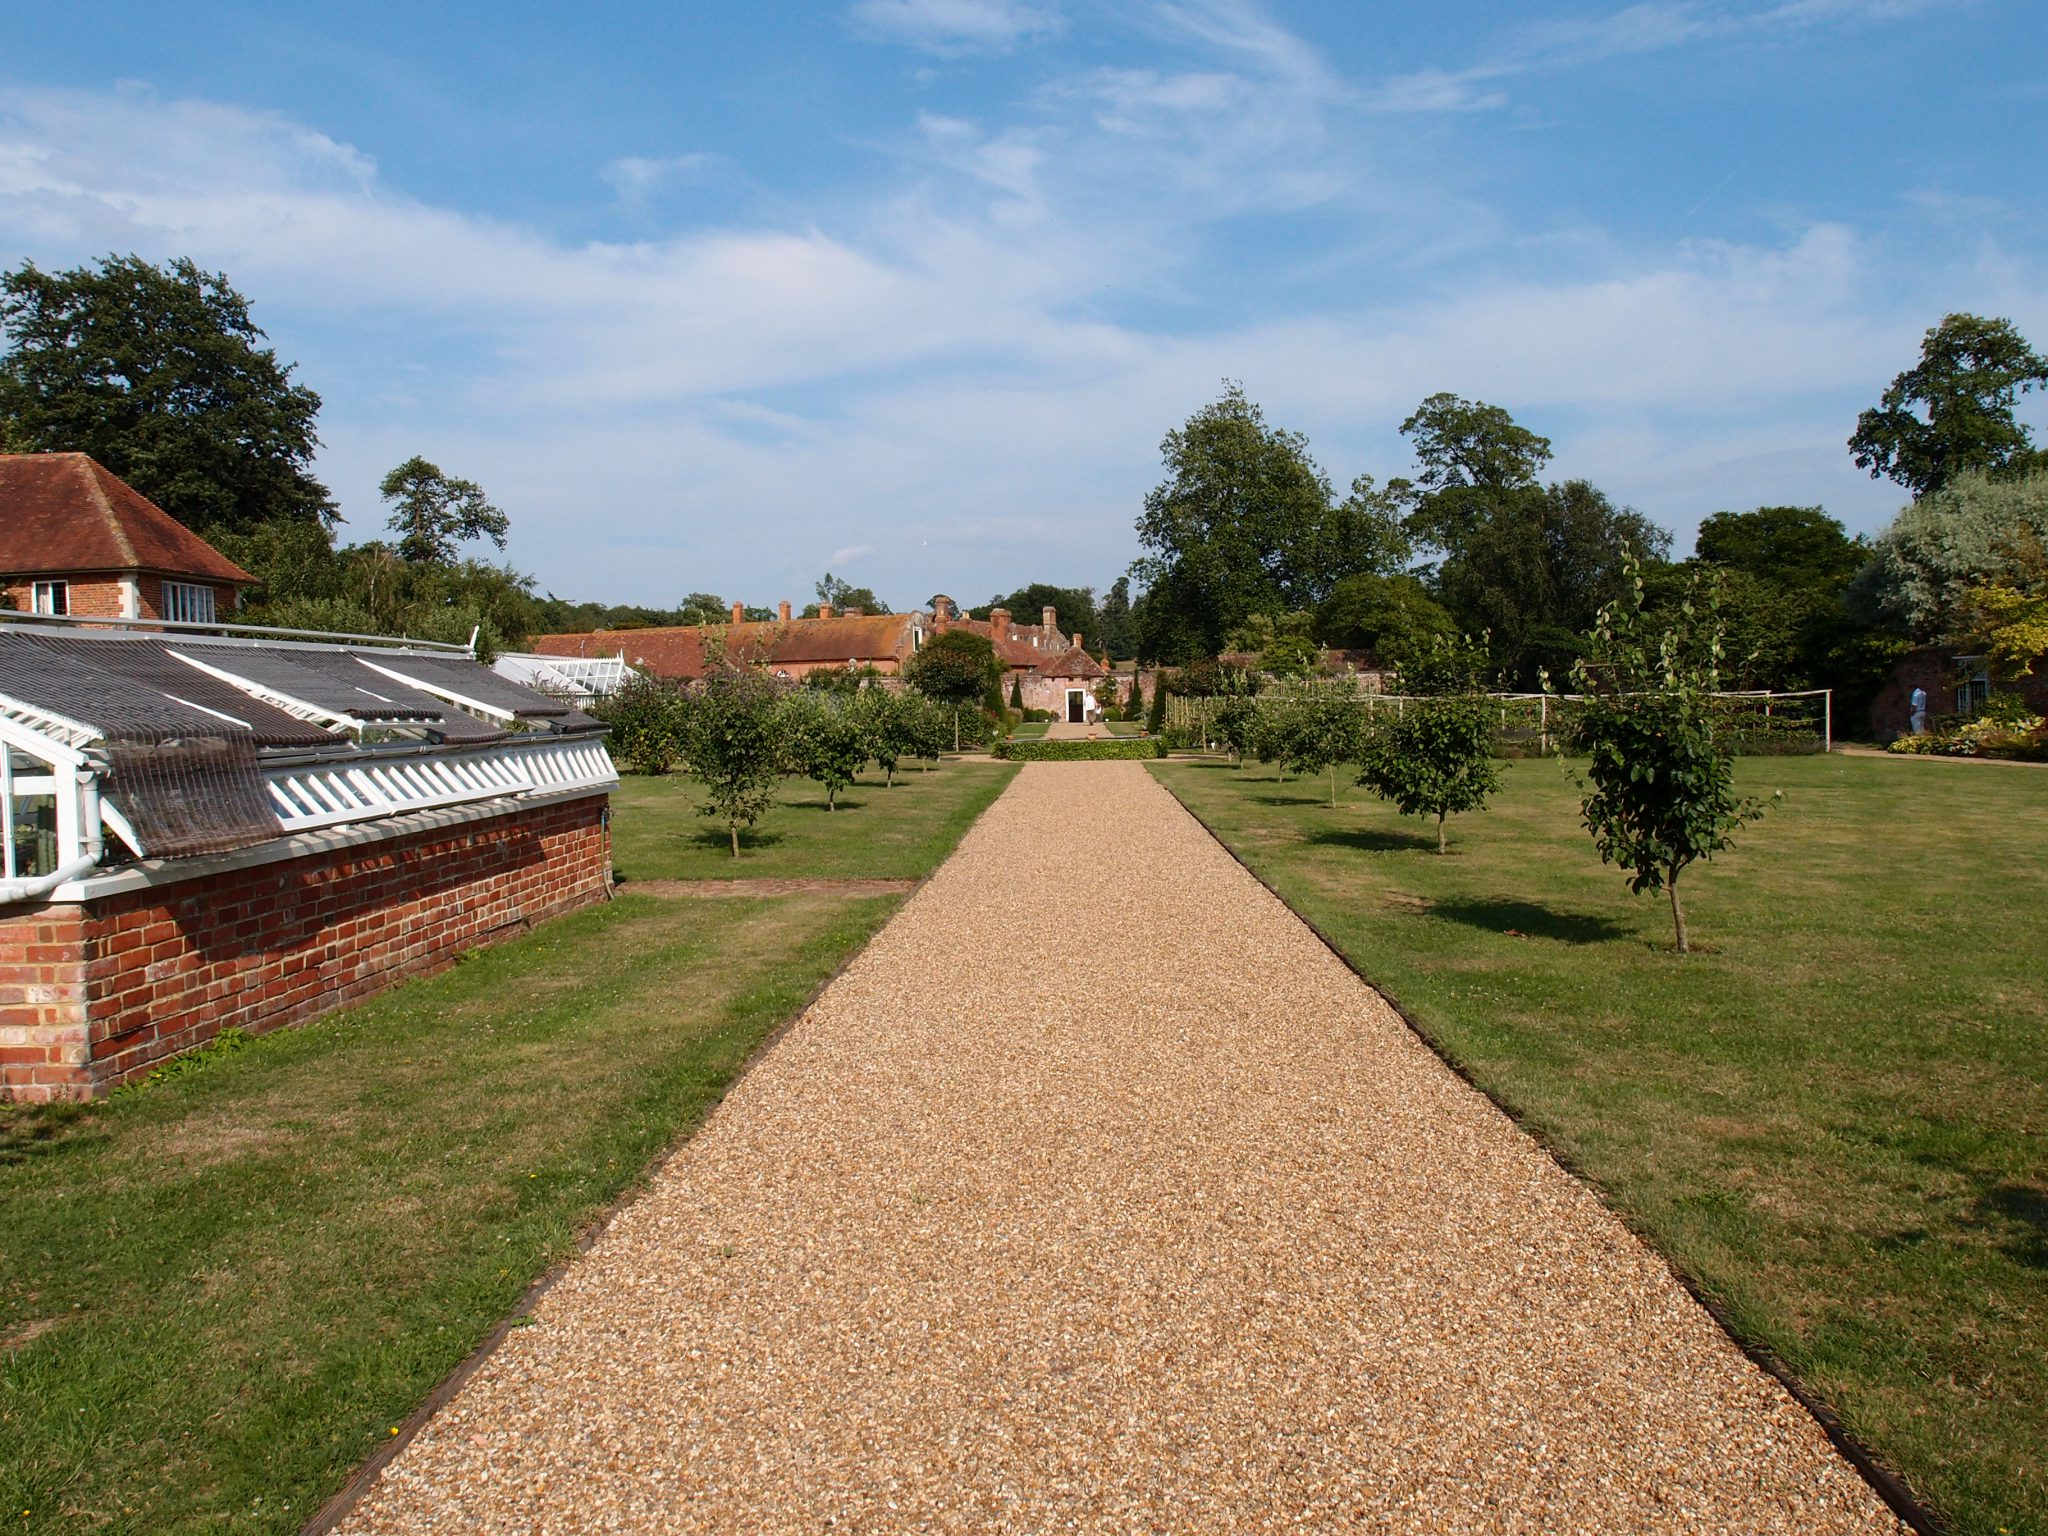 In the Walled Garden, we look back toward the brick gazebo, at the edge of the Italian Garden